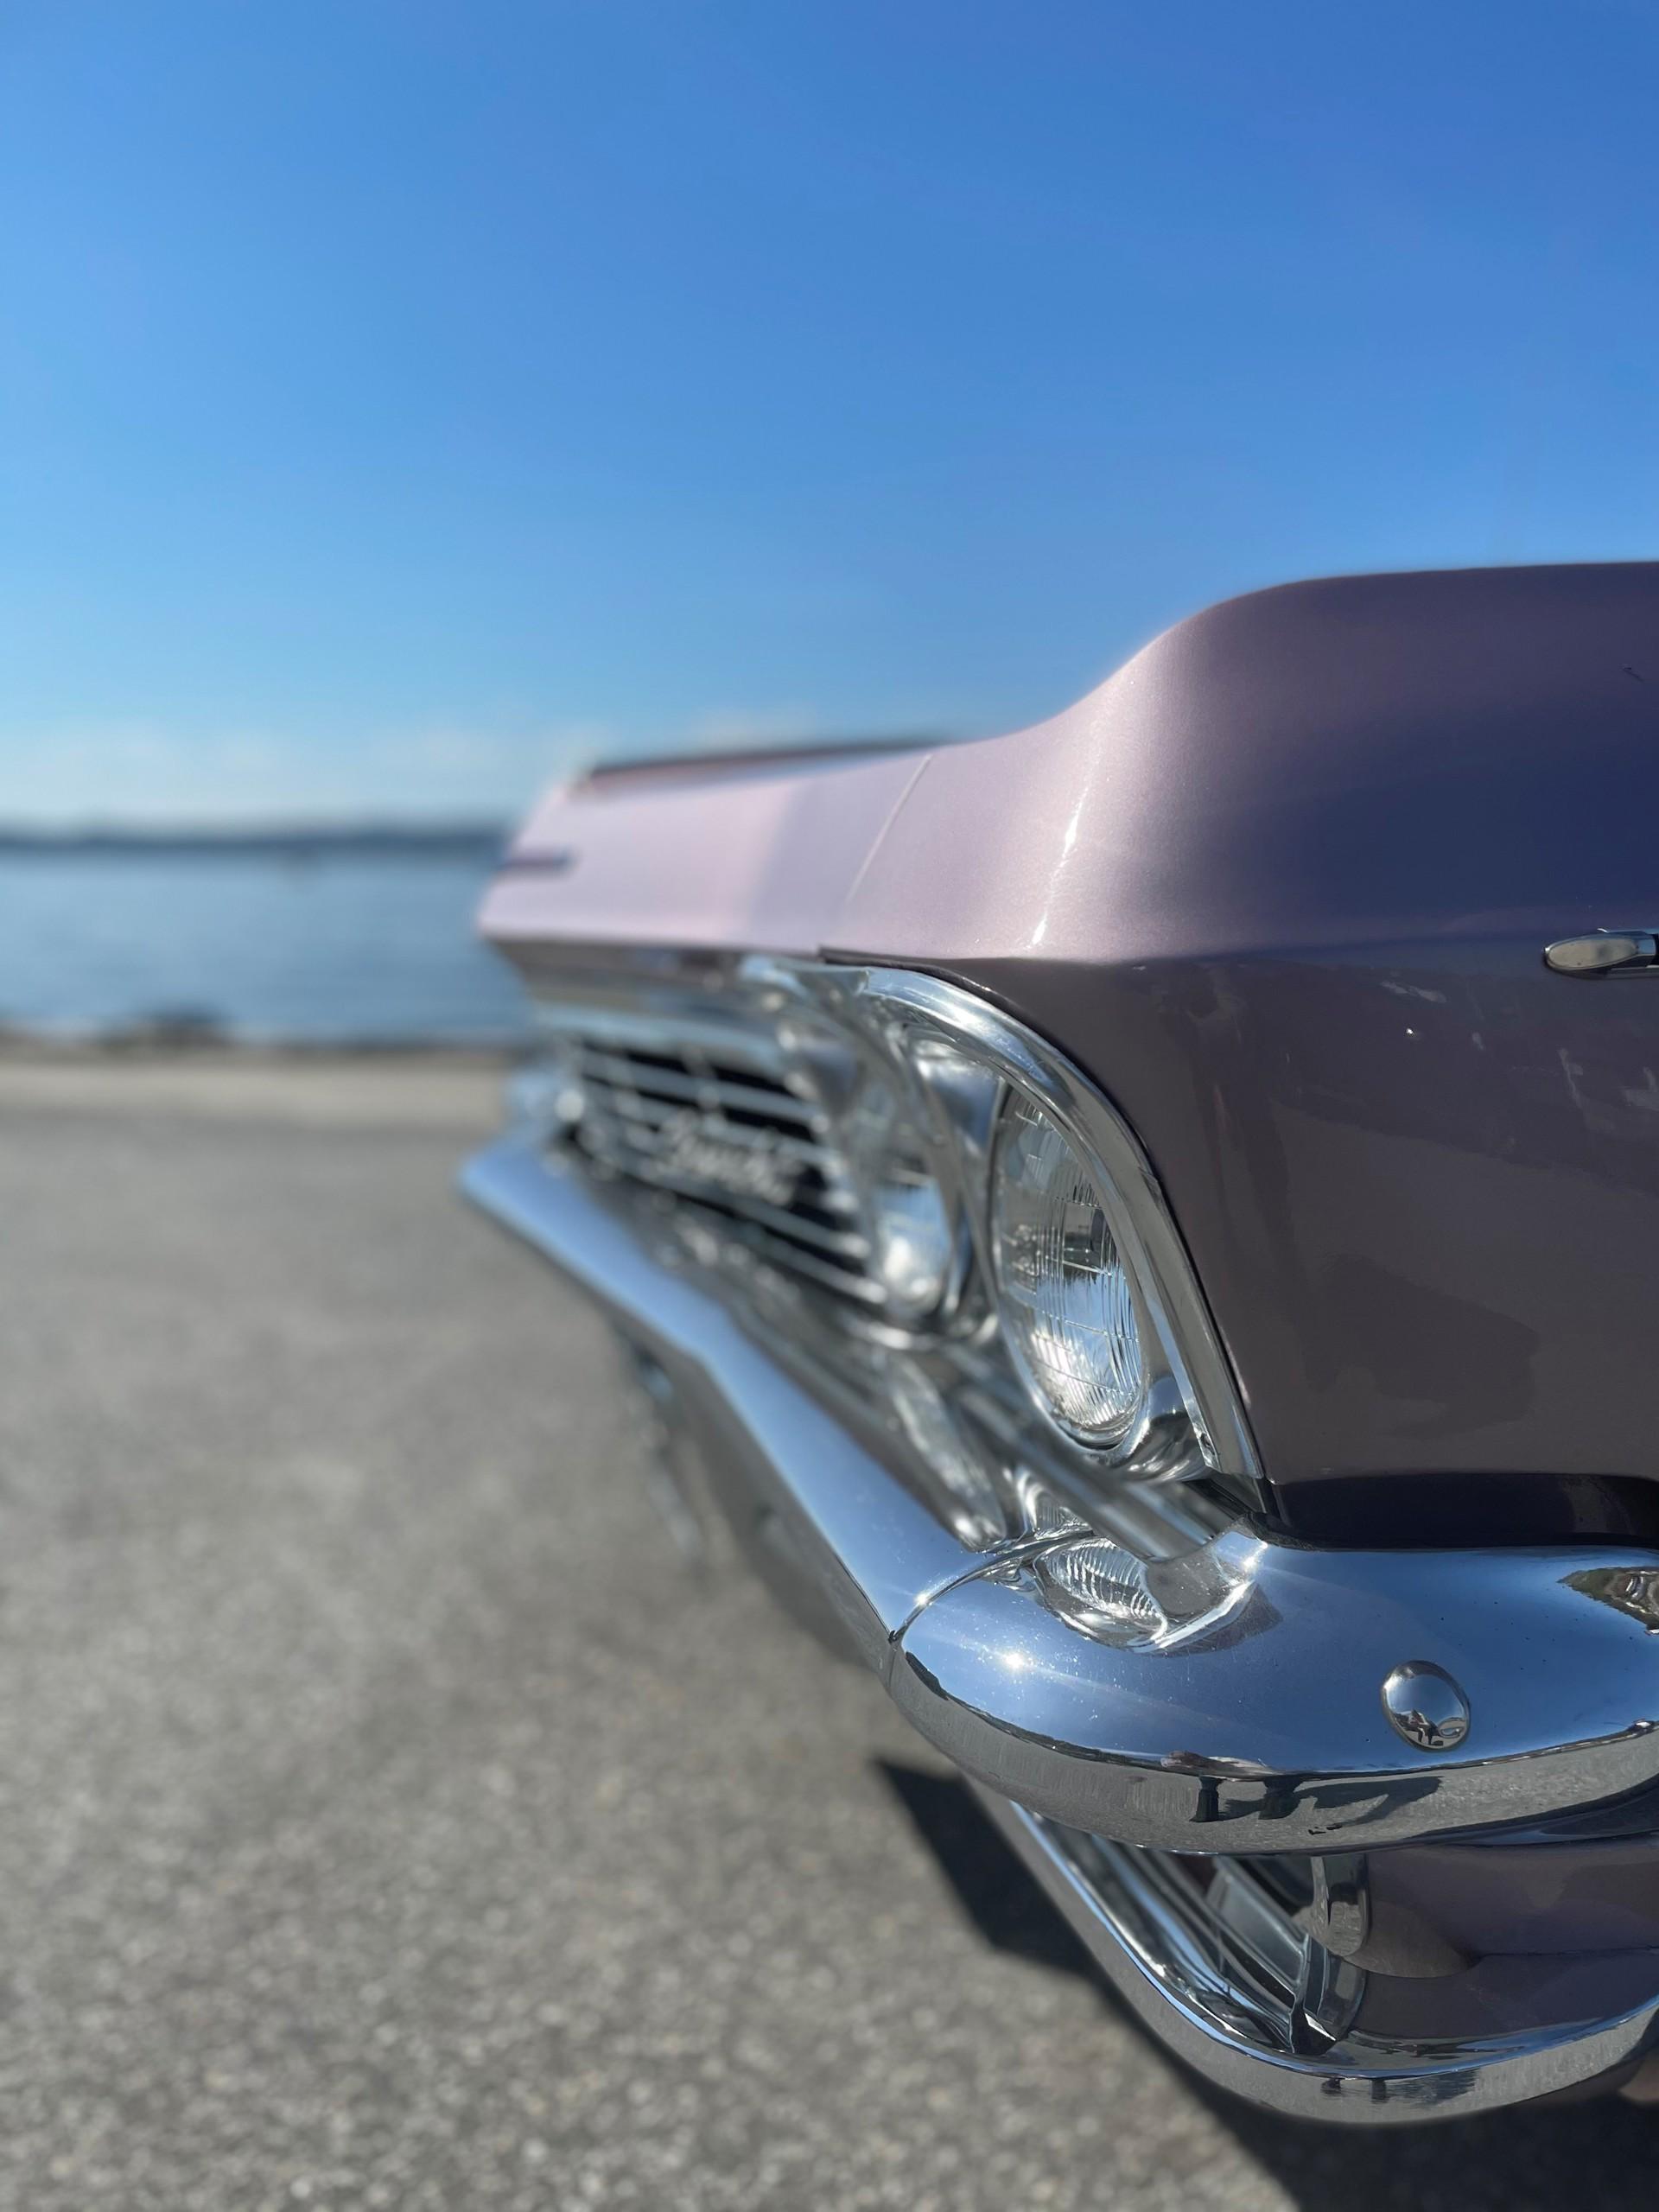 316-1965 Chevrolet Impala convertible 03. Eiere- m